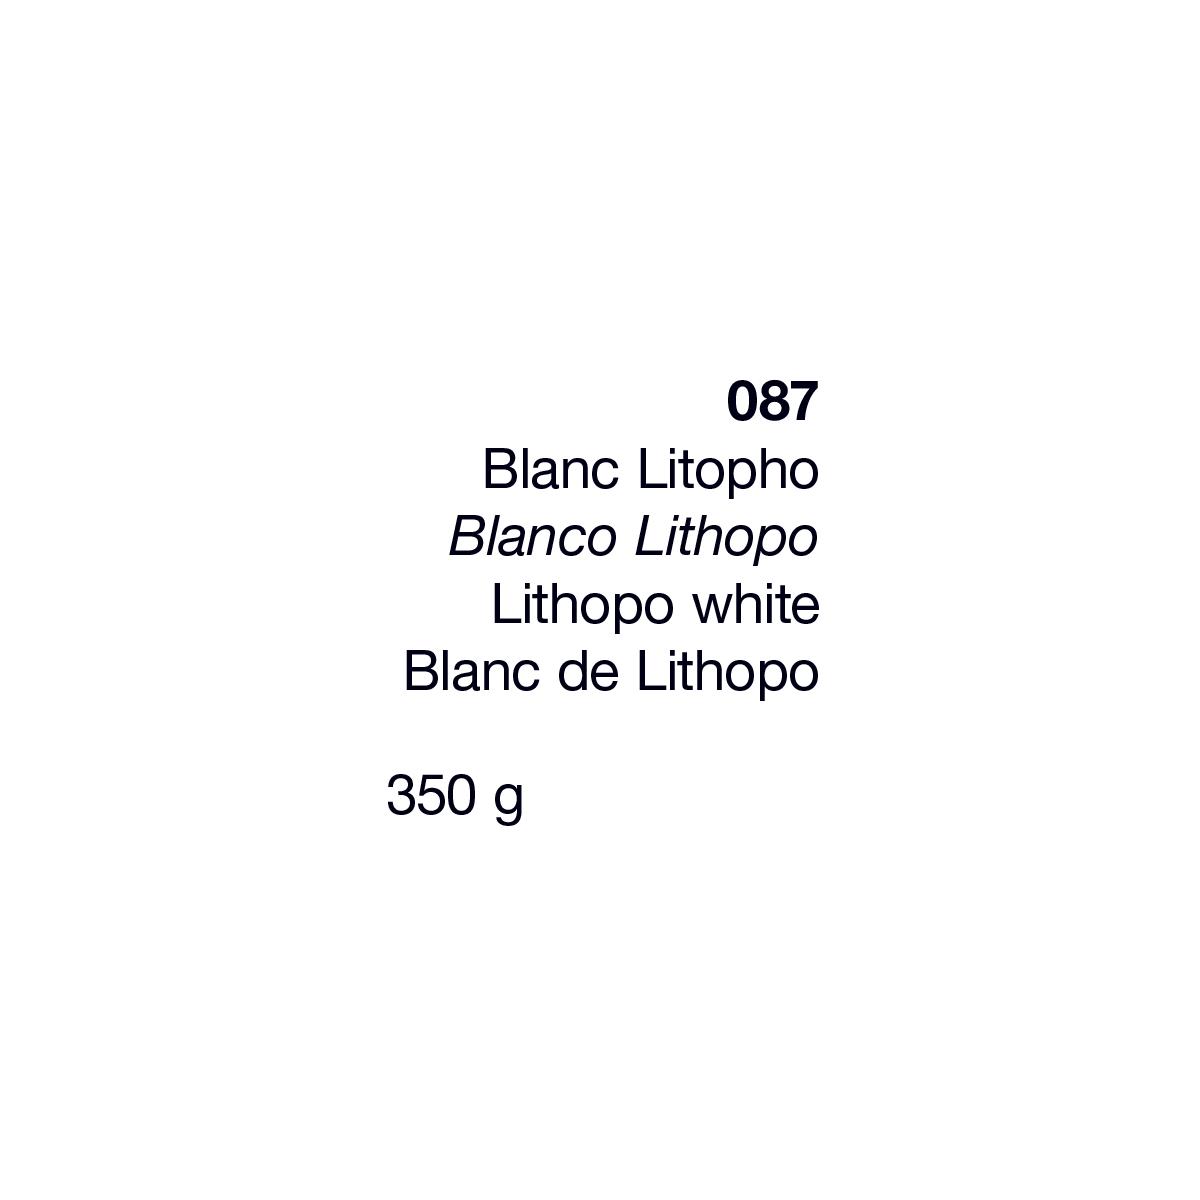 PIGMENTO BLANCO LITHOPONE...